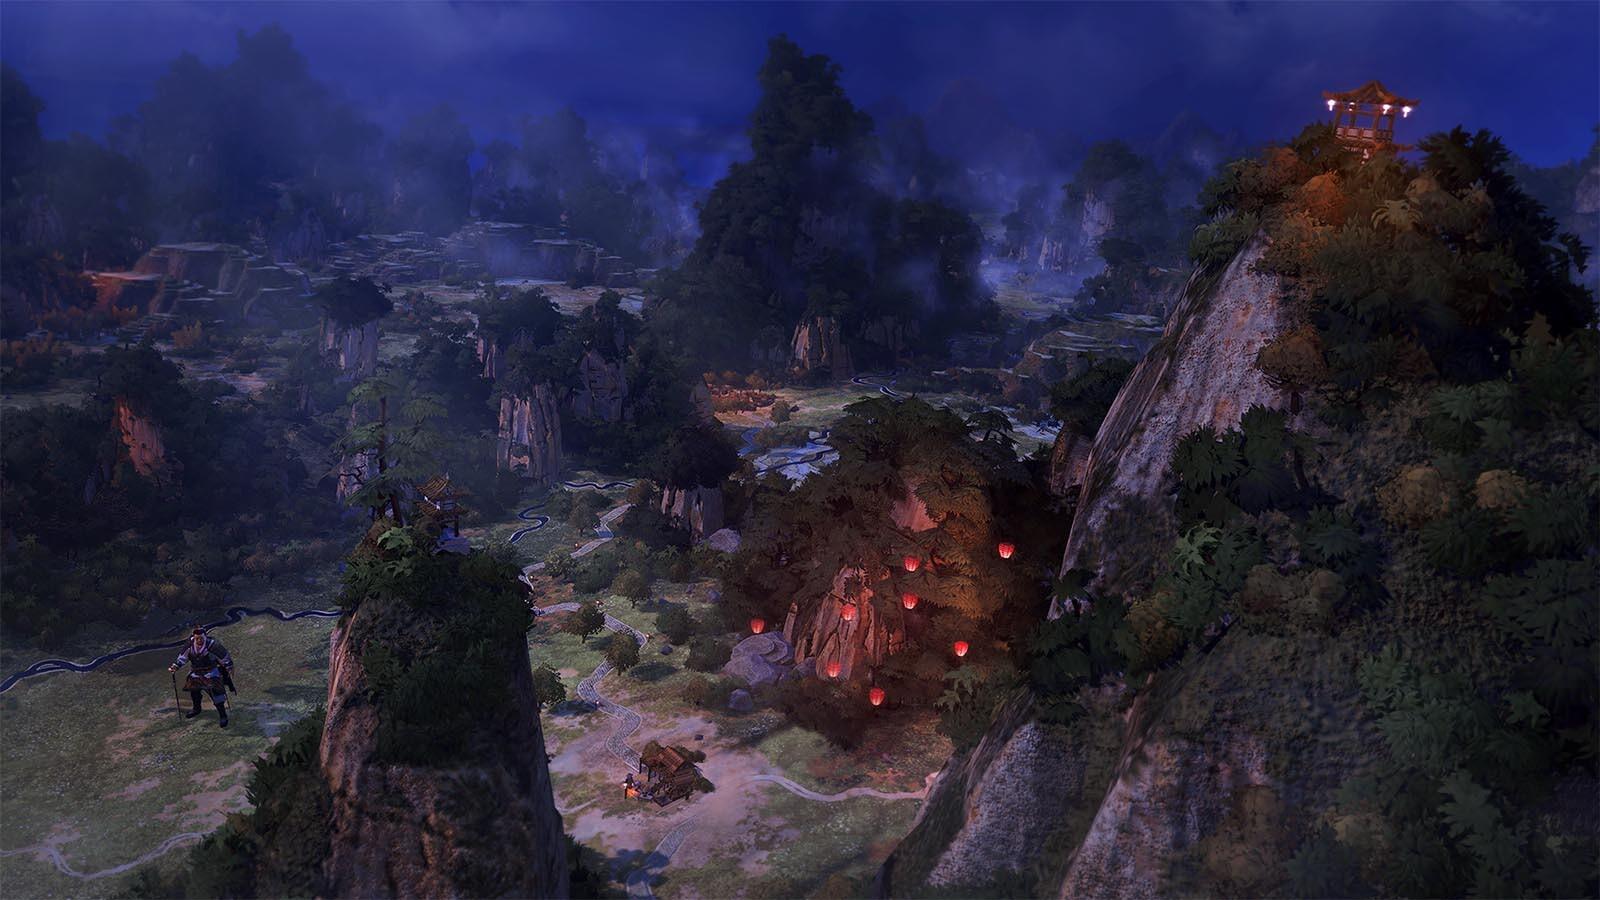 Total War: THREE KINGDOMS [Steam CD Key] for PC - Buy now